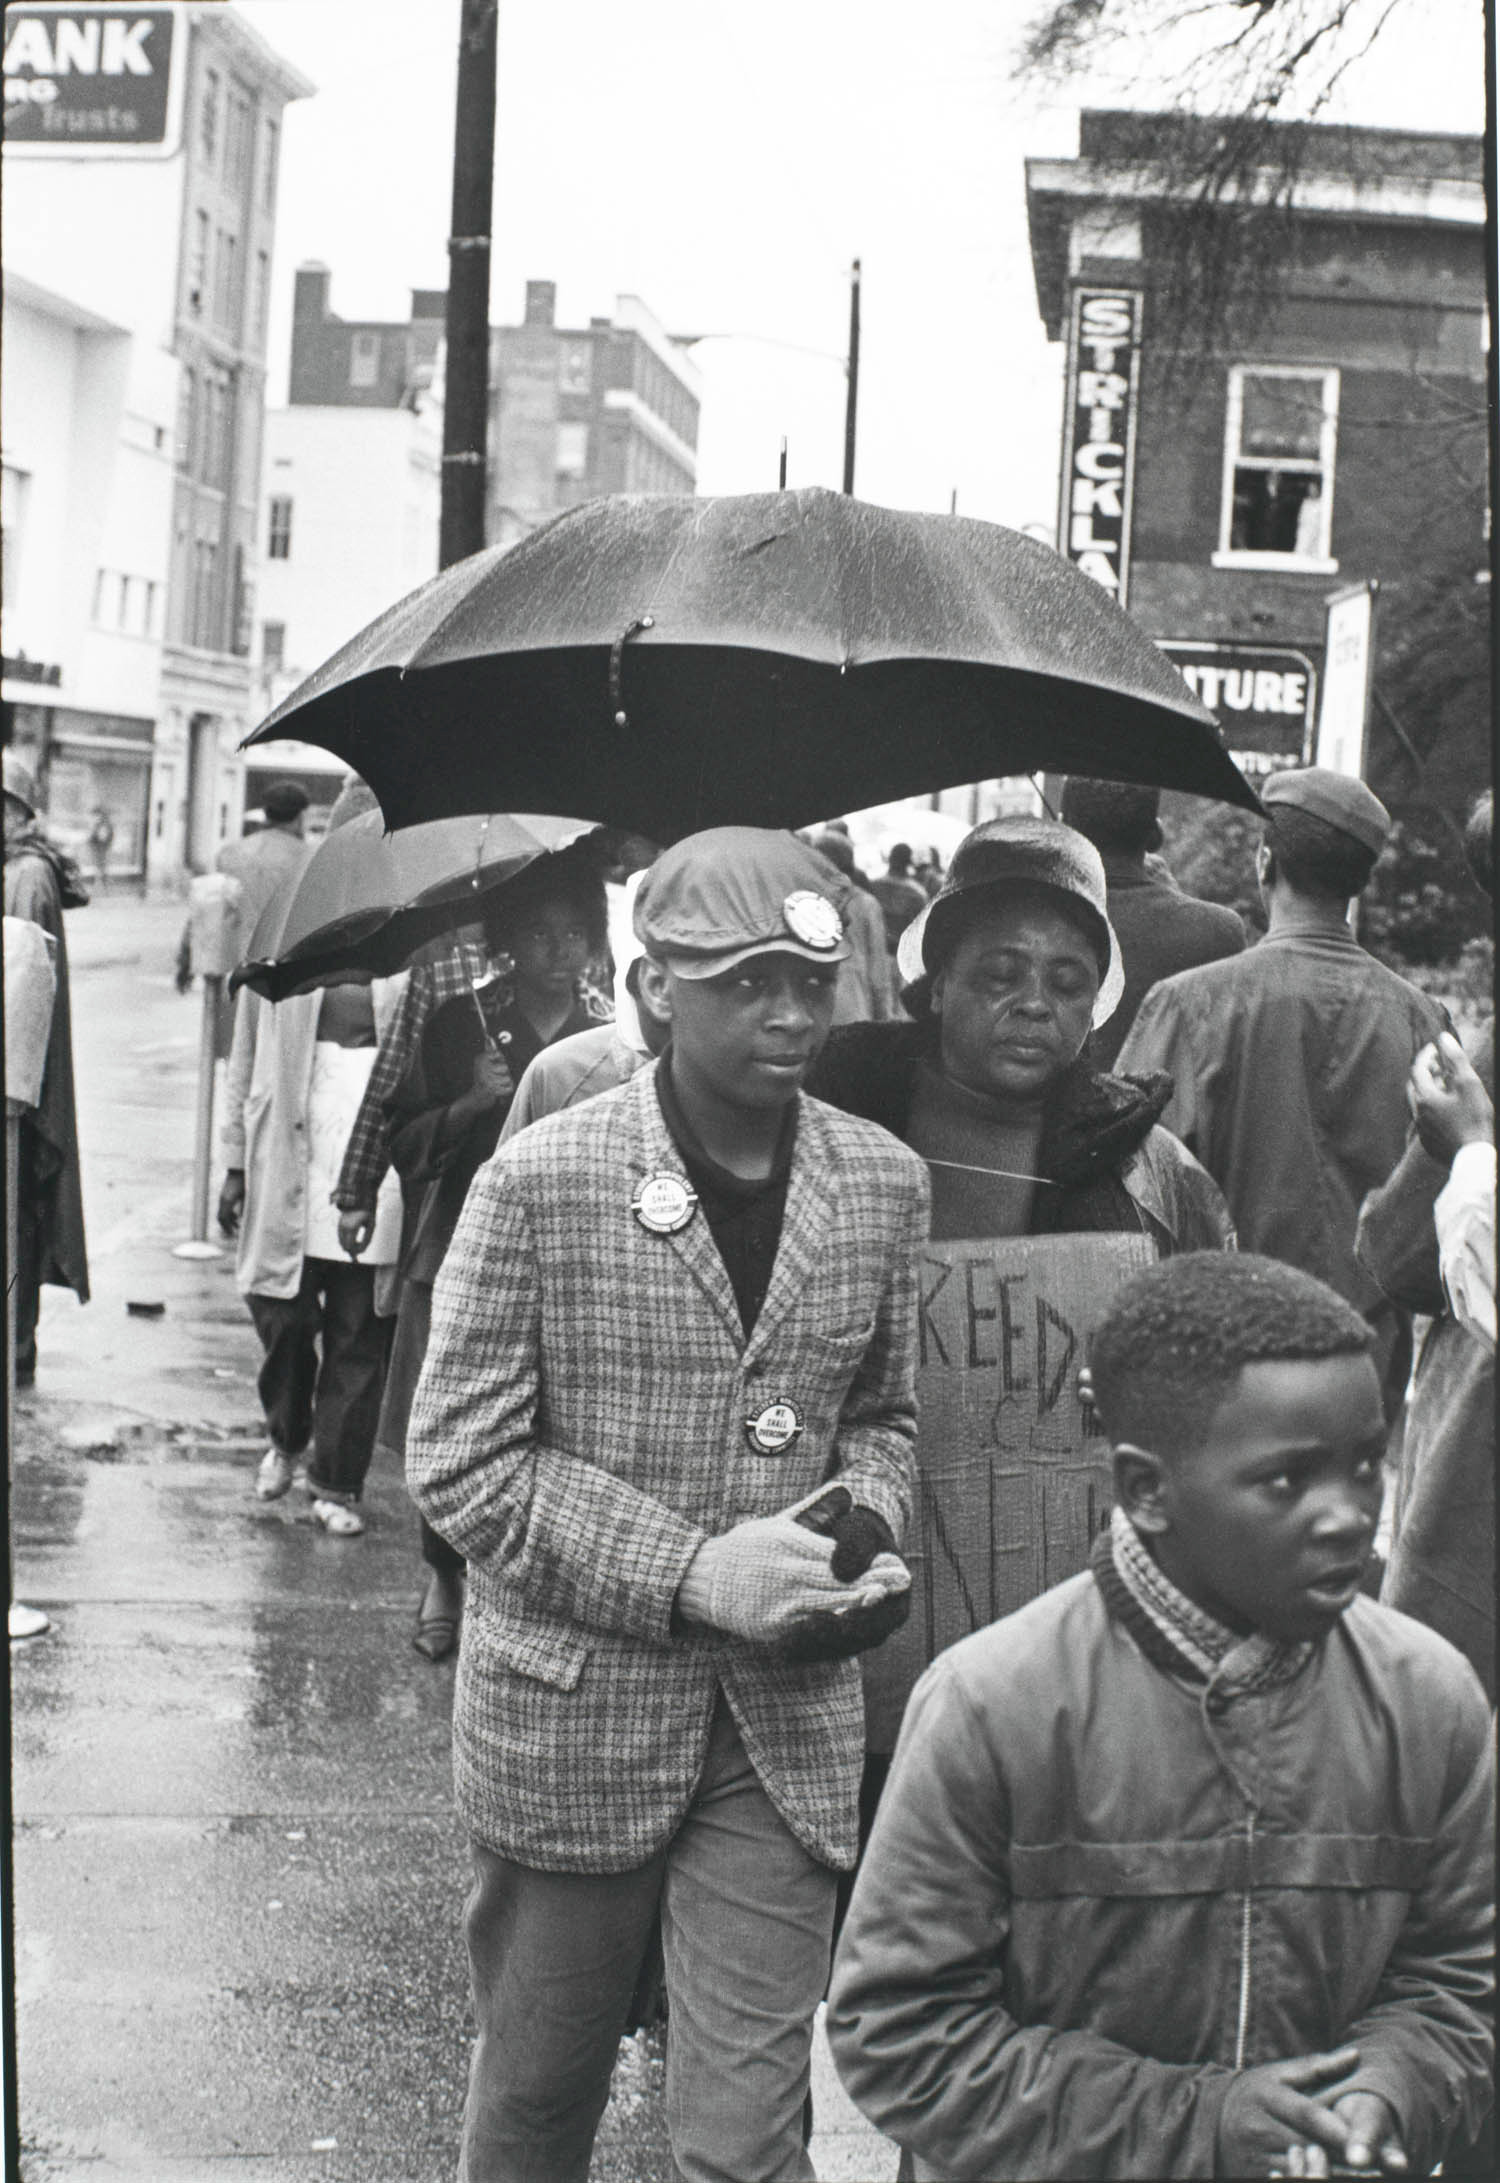 Fig. 3. Danny Lyon, Fannie Lou Hamer, Hattiesburg, Mississippi, 1964, Gelatin silver print. Image copyright Danny Lyon.